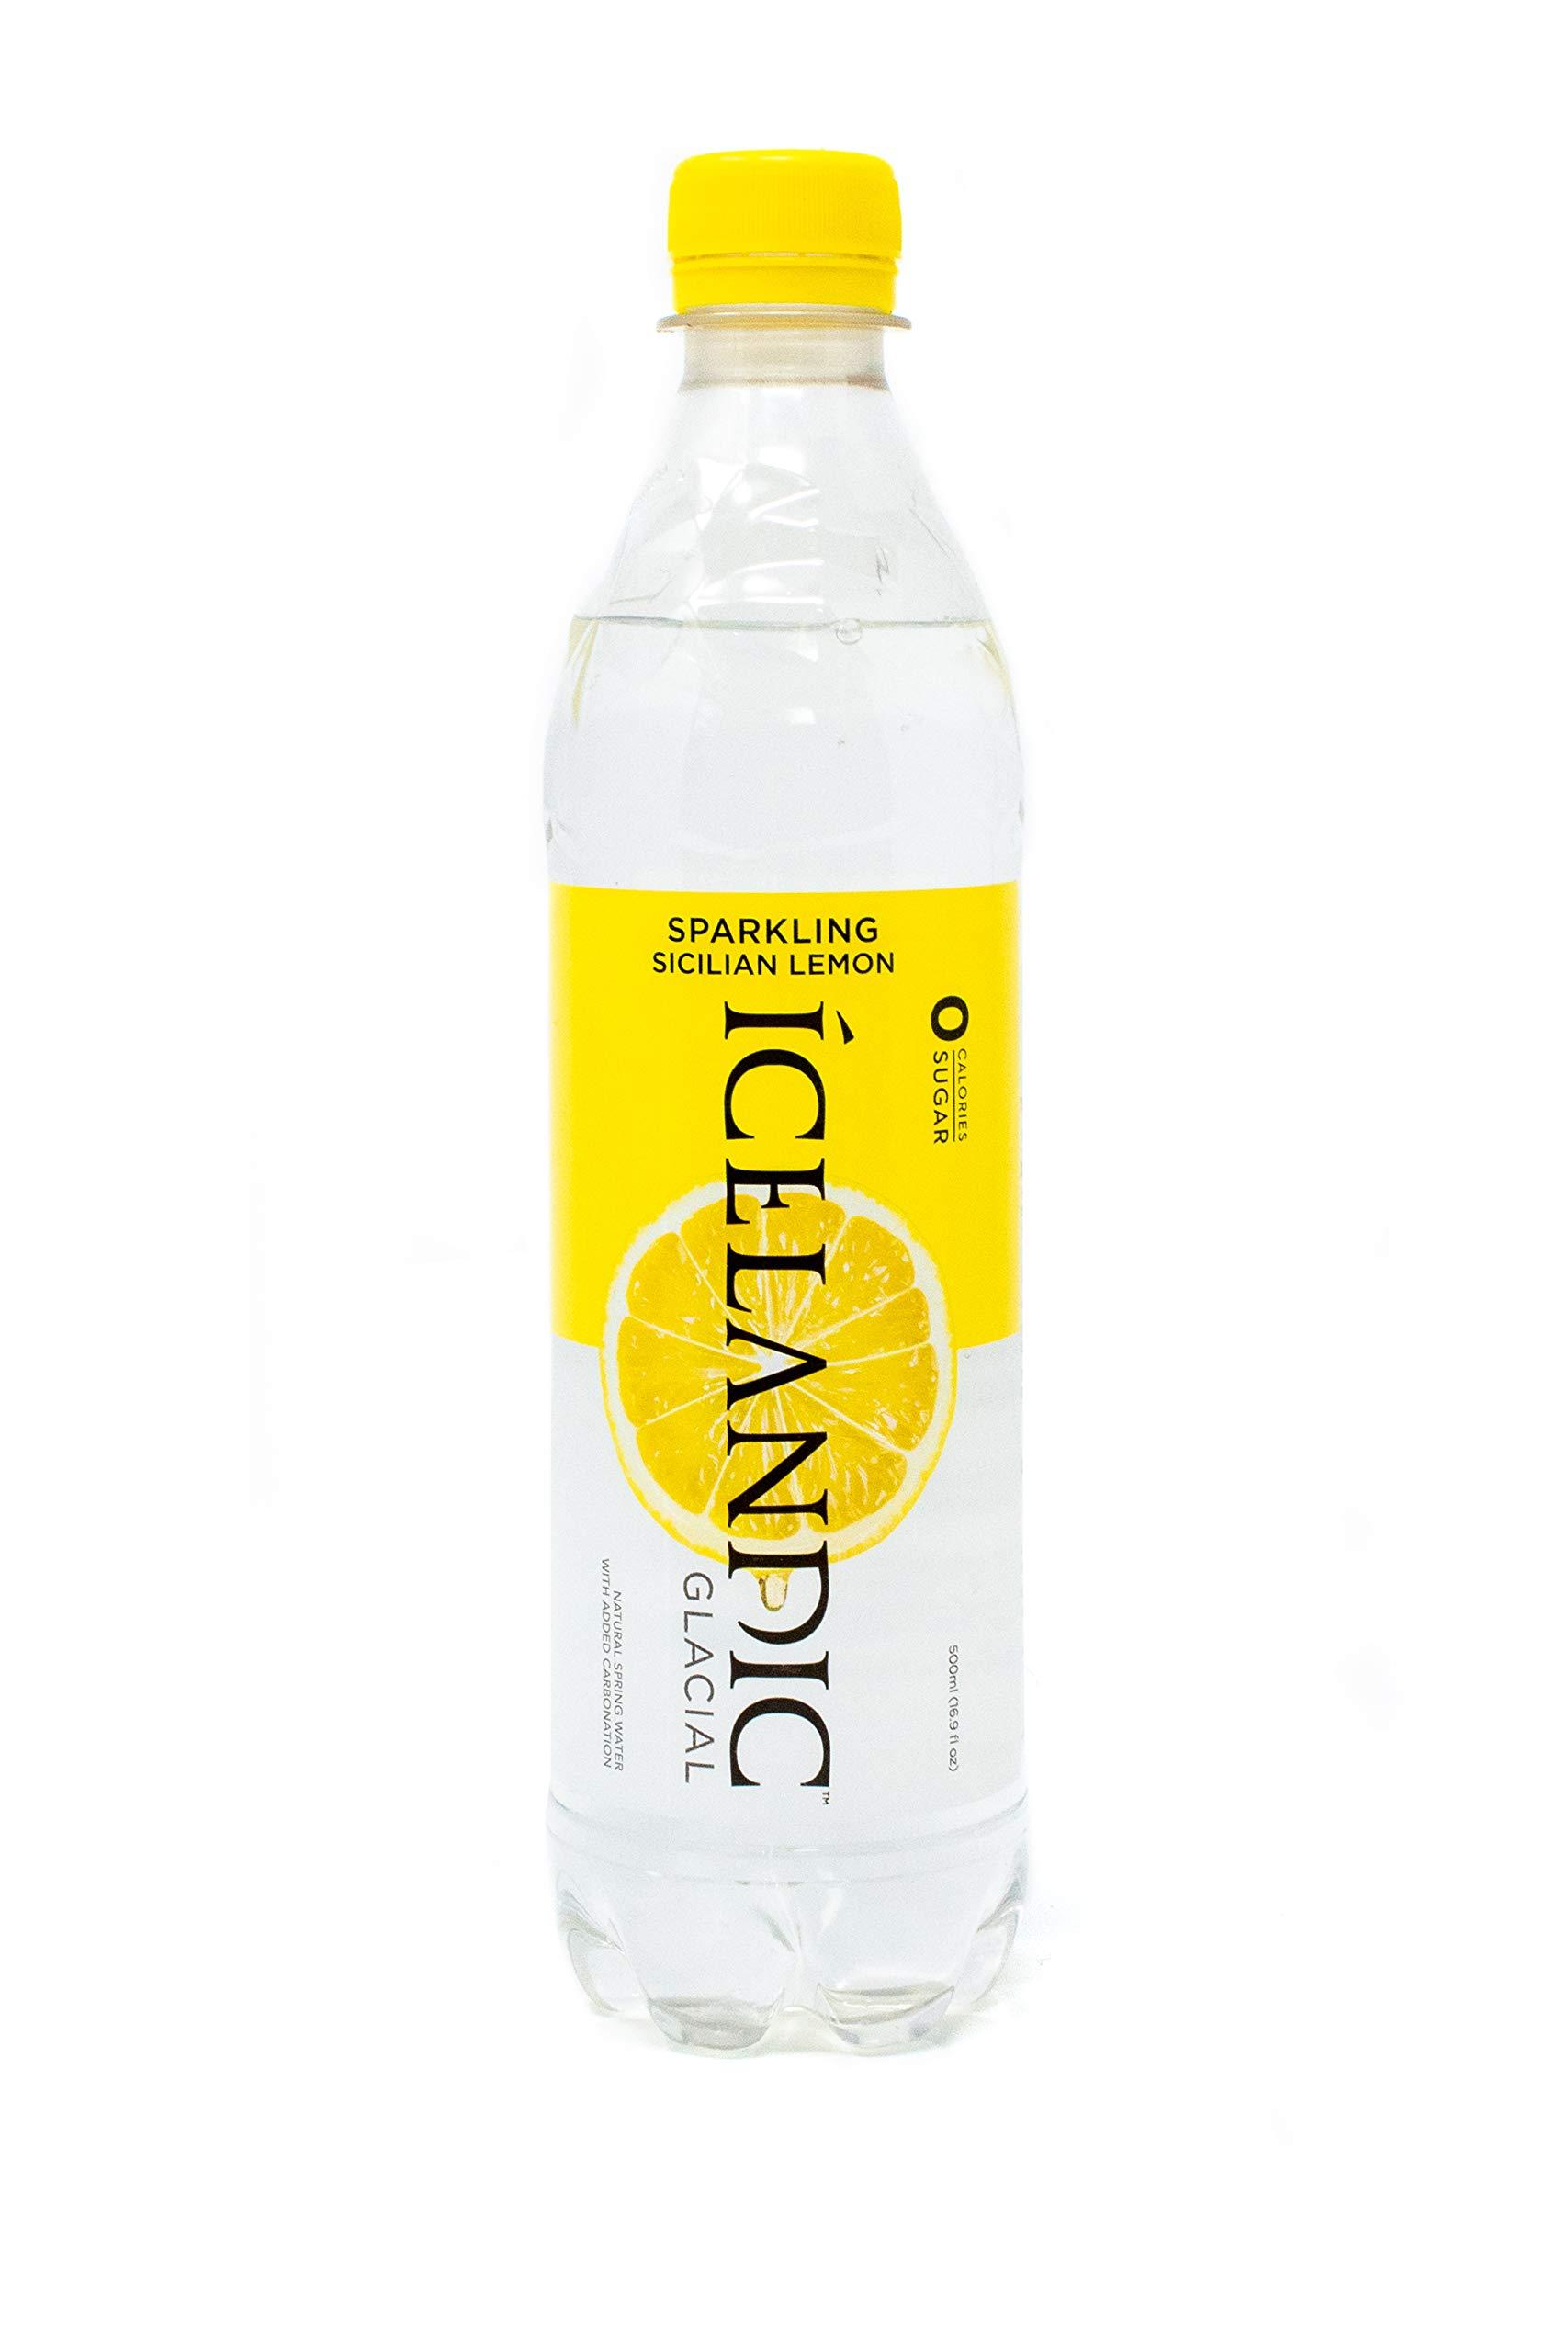 Icelandic Glacial Sparkling Water, Sicilian Lemon, 500 Milliliter, 24 Count